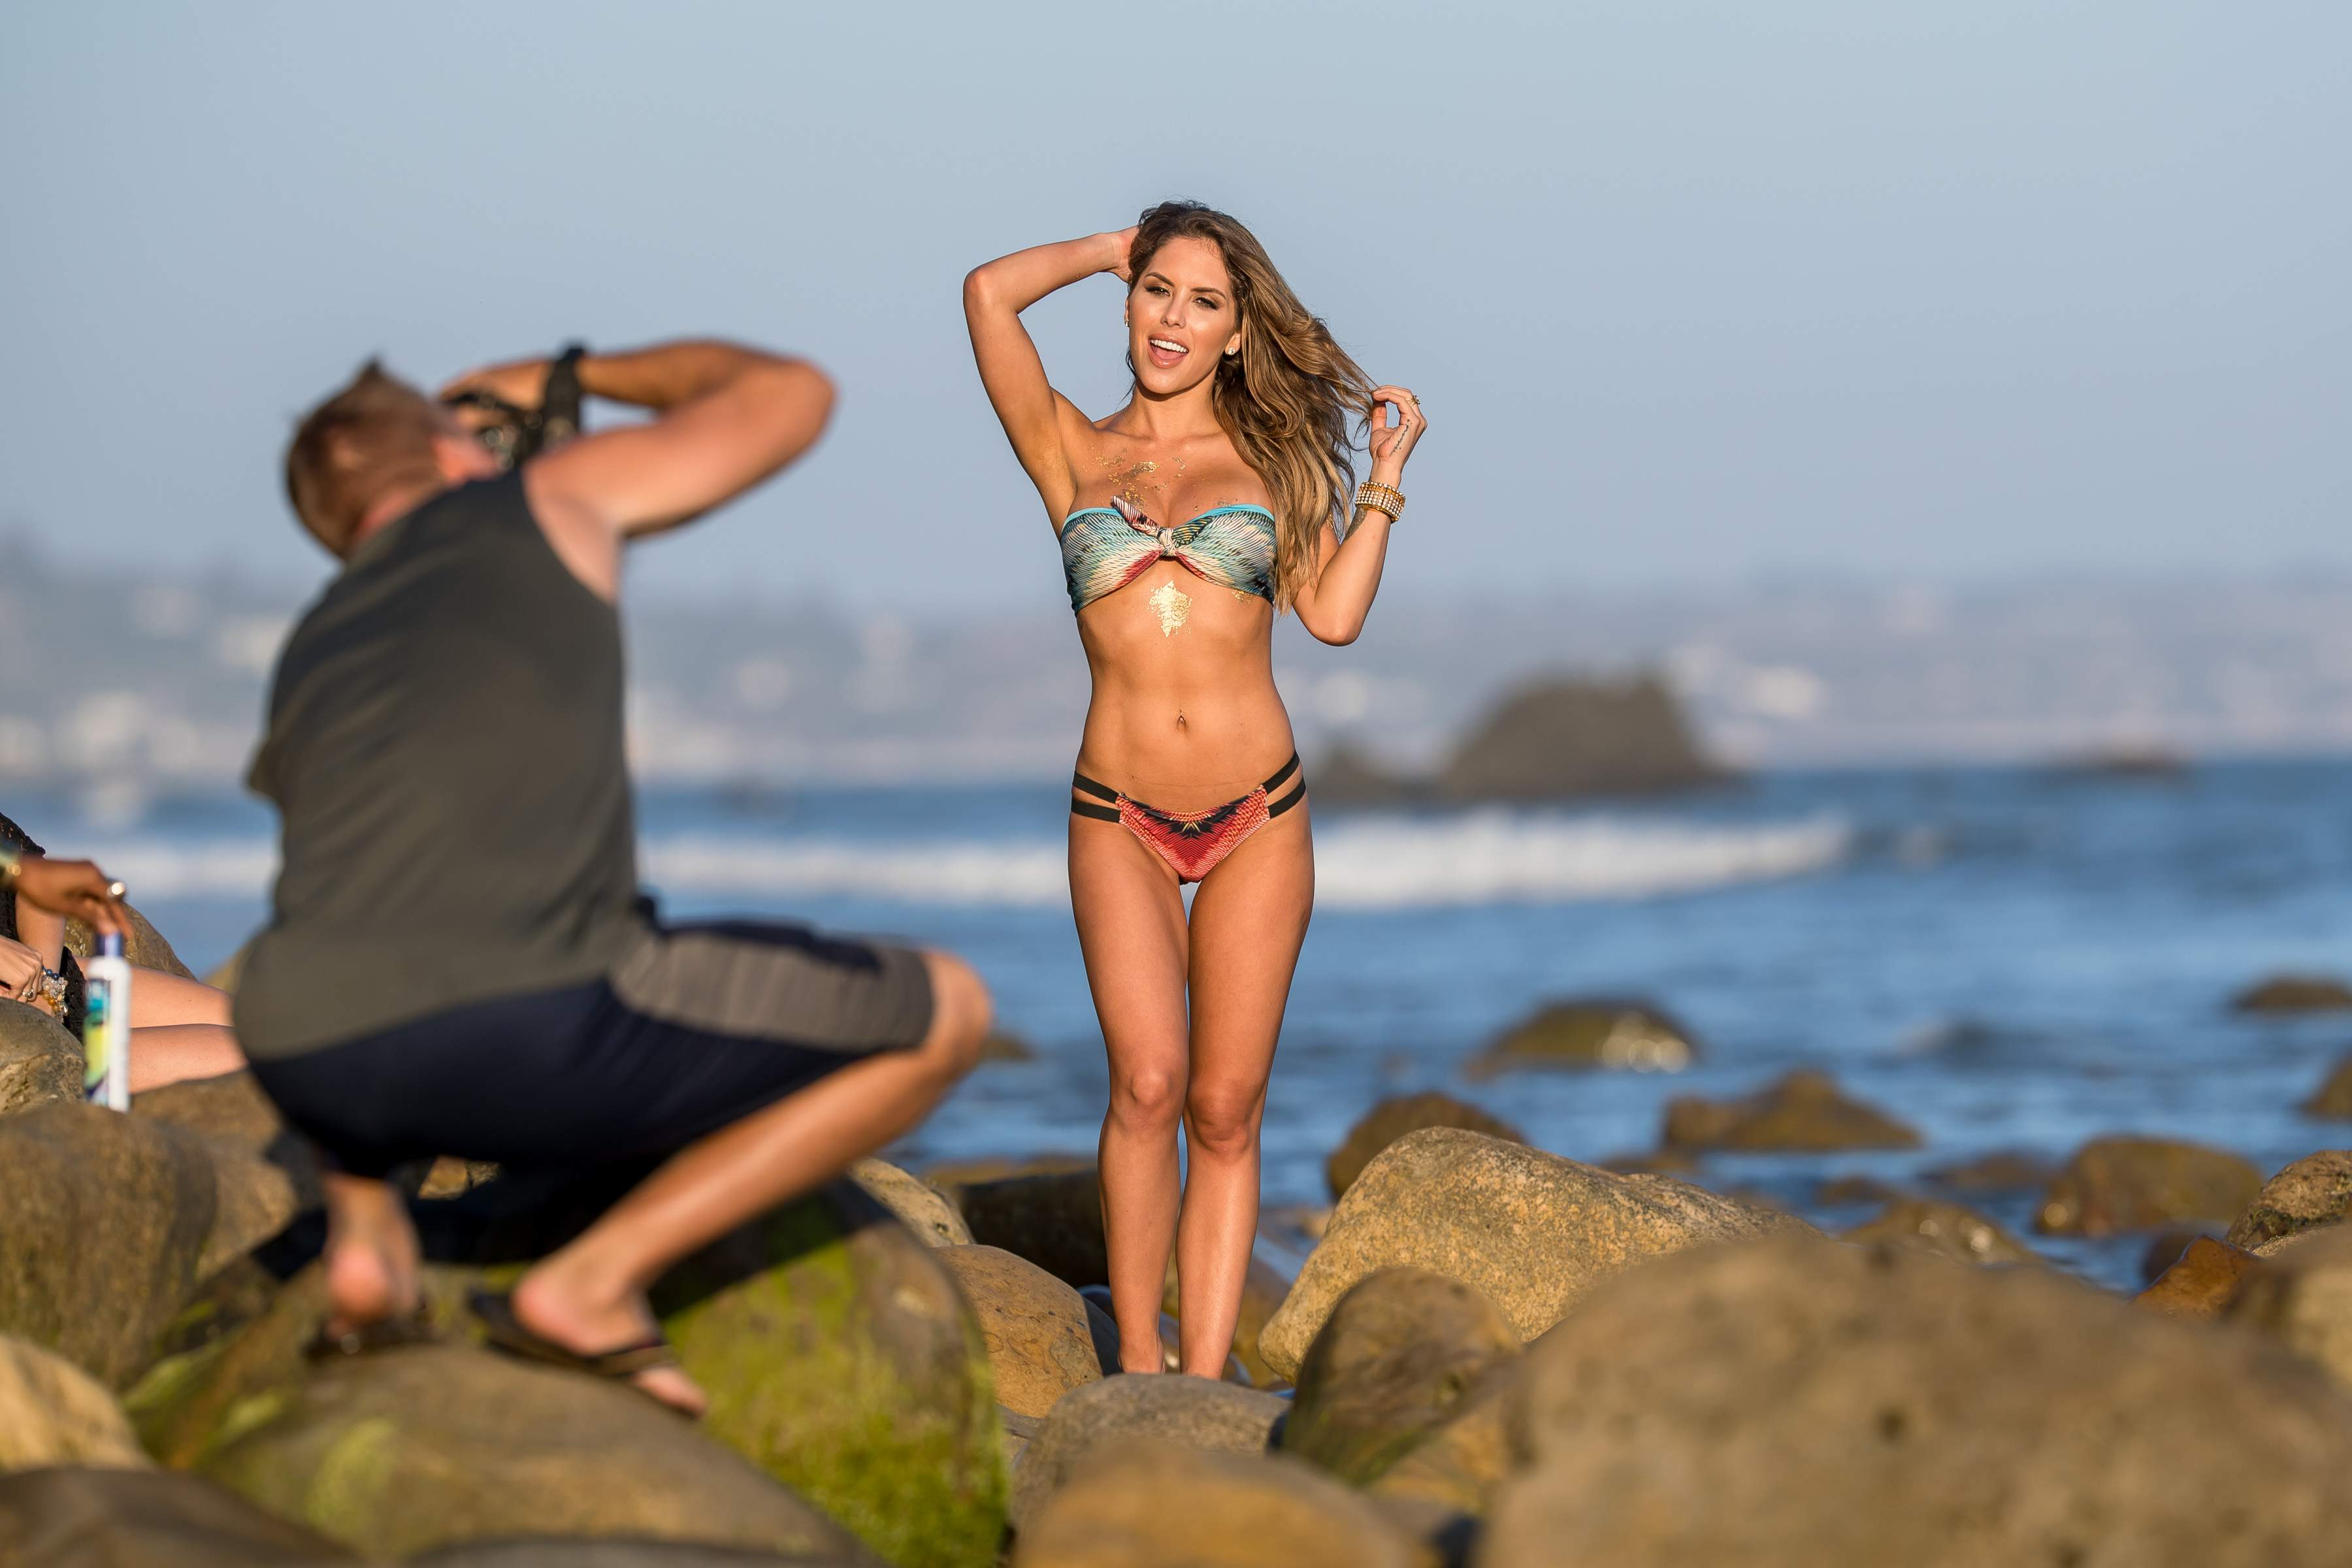 Brittney-Palmer-Sexy-22-thefappeningblog.com_.jpg